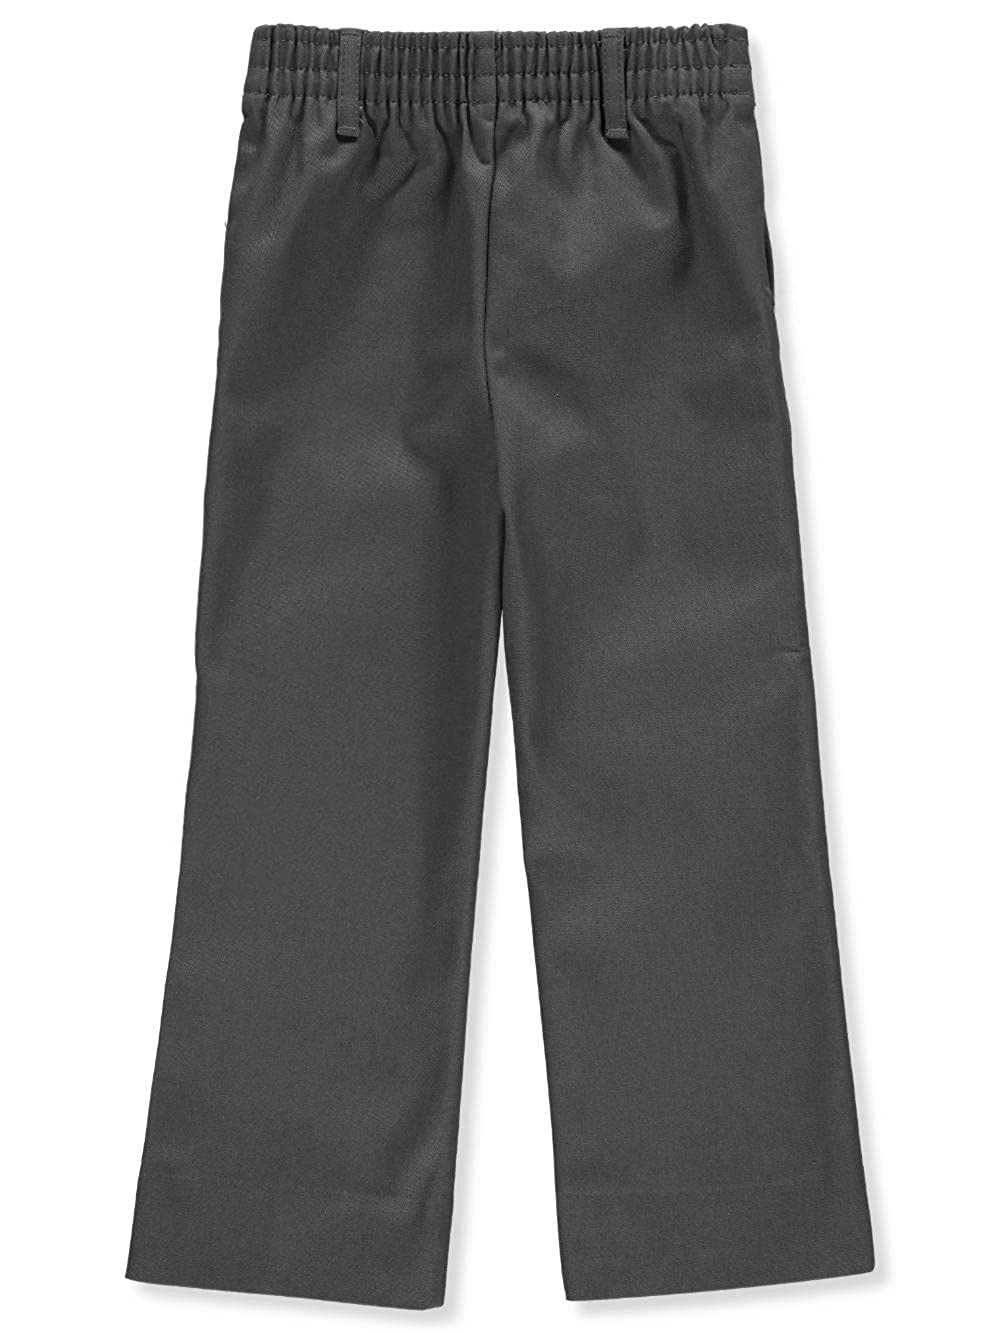 Rifle Little Boys Toddler Flat Front Pants